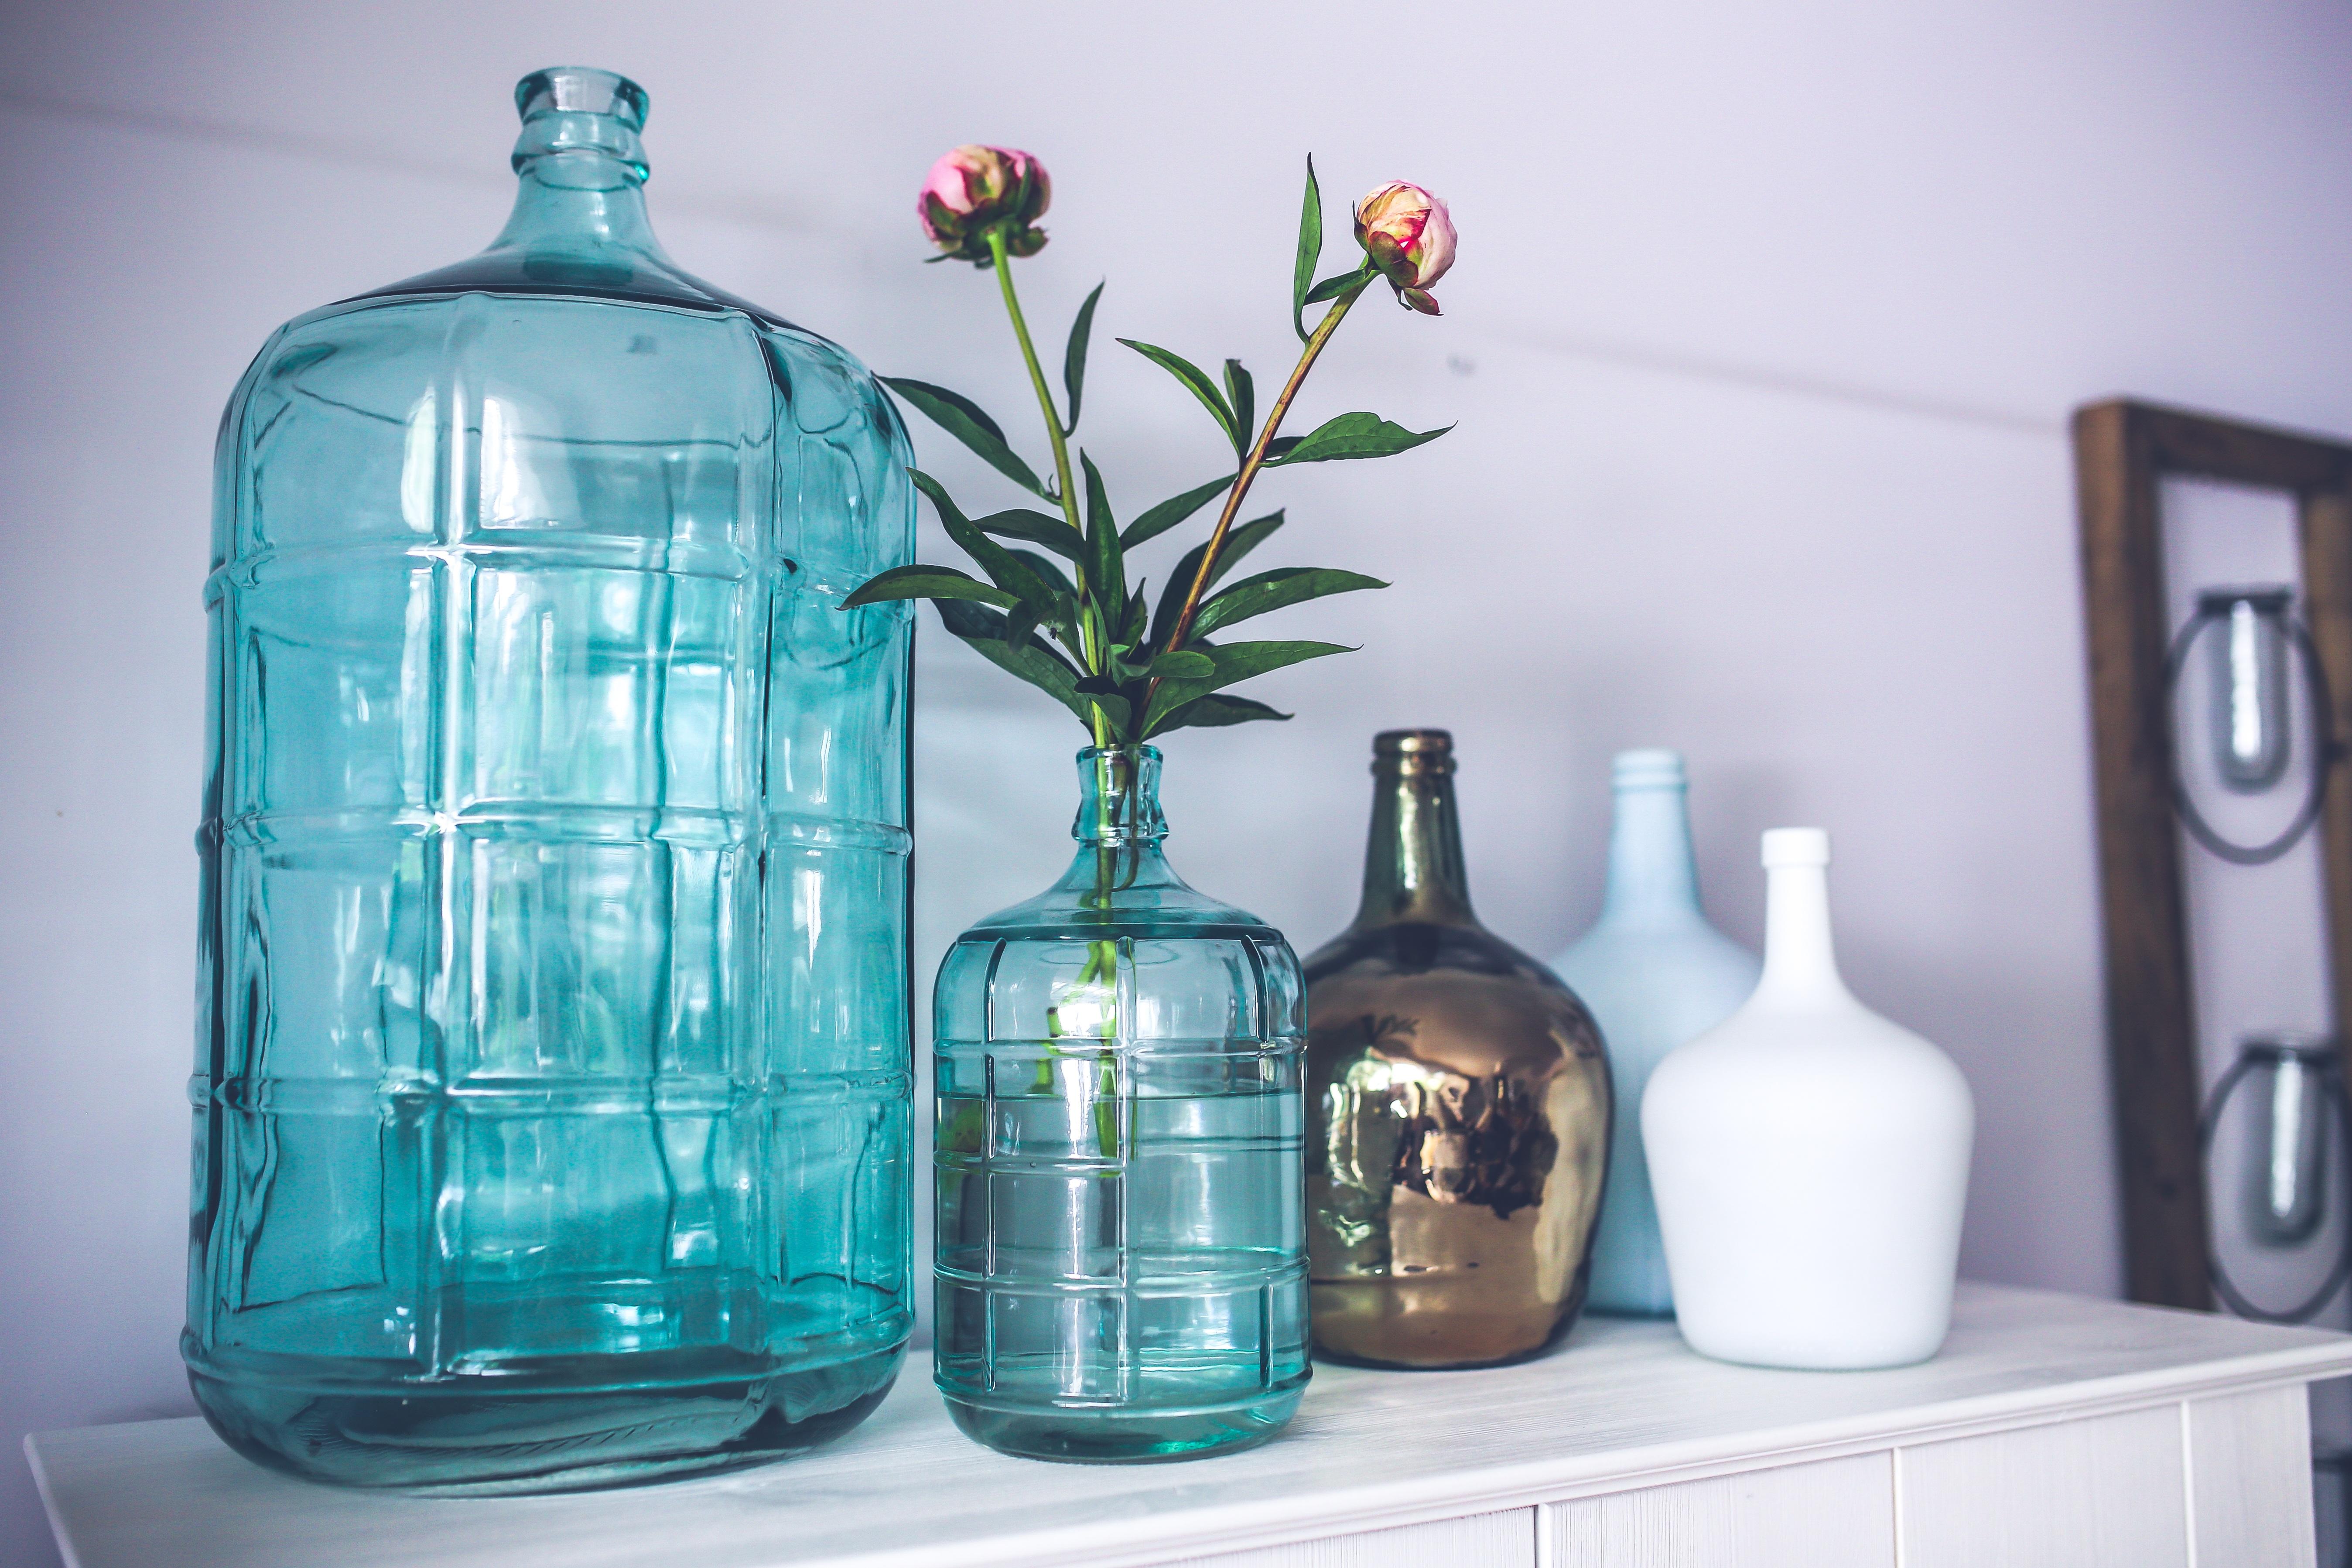 Free images flower vase decoration blue decor tableware flower glass vase decoration bottle blue decor tableware glass bottle mason jar product dutch scandinavian carafe reviewsmspy